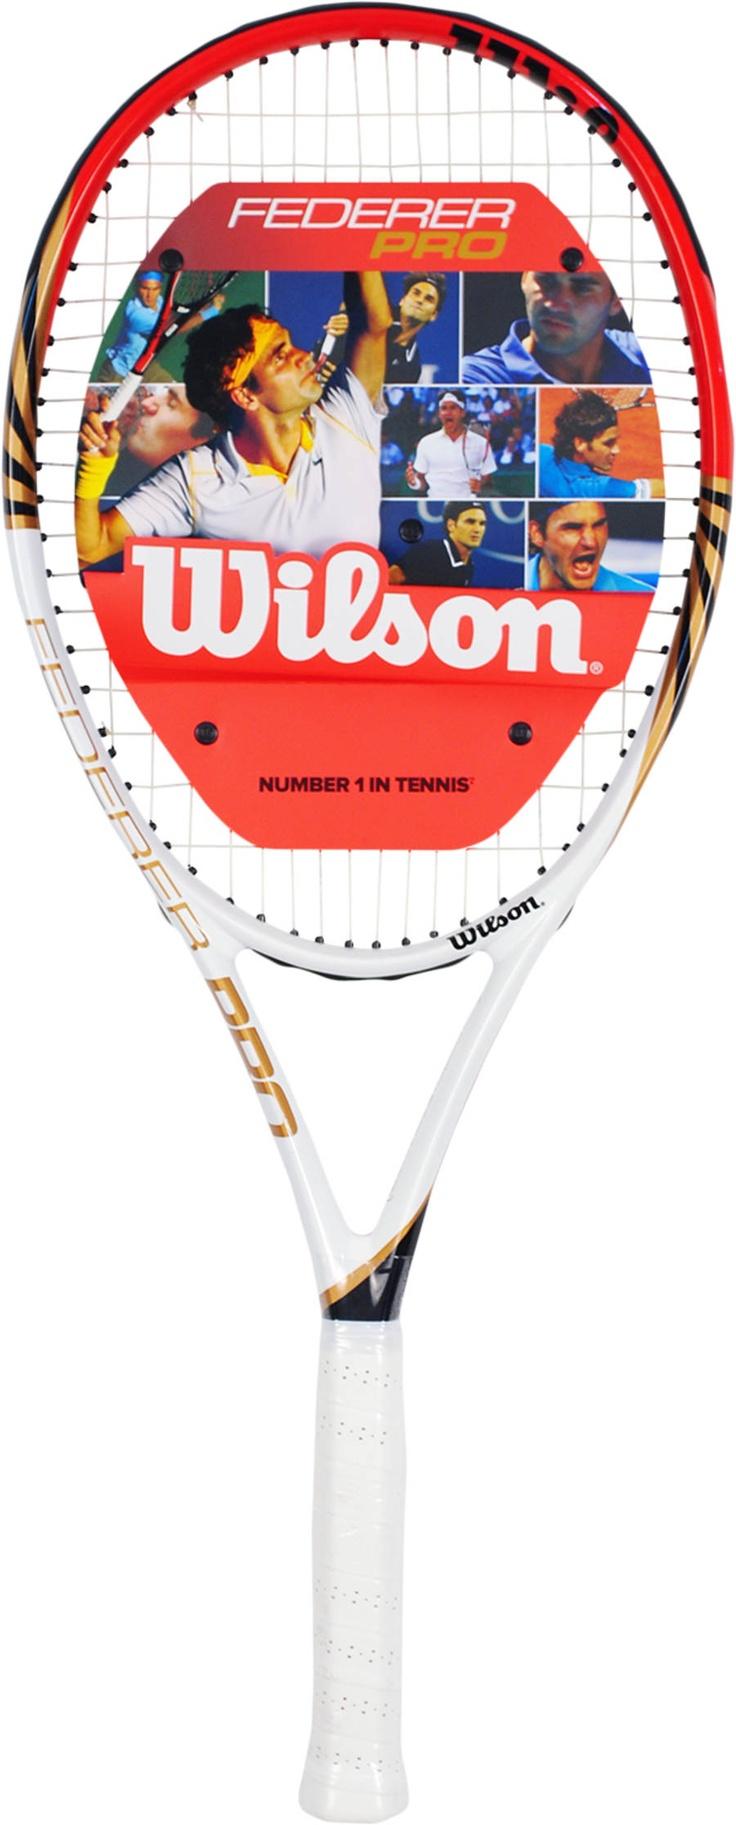 Racheta FEDERER PRO No 3 - Wilson | INTERSPORT.ro - Sport to the People